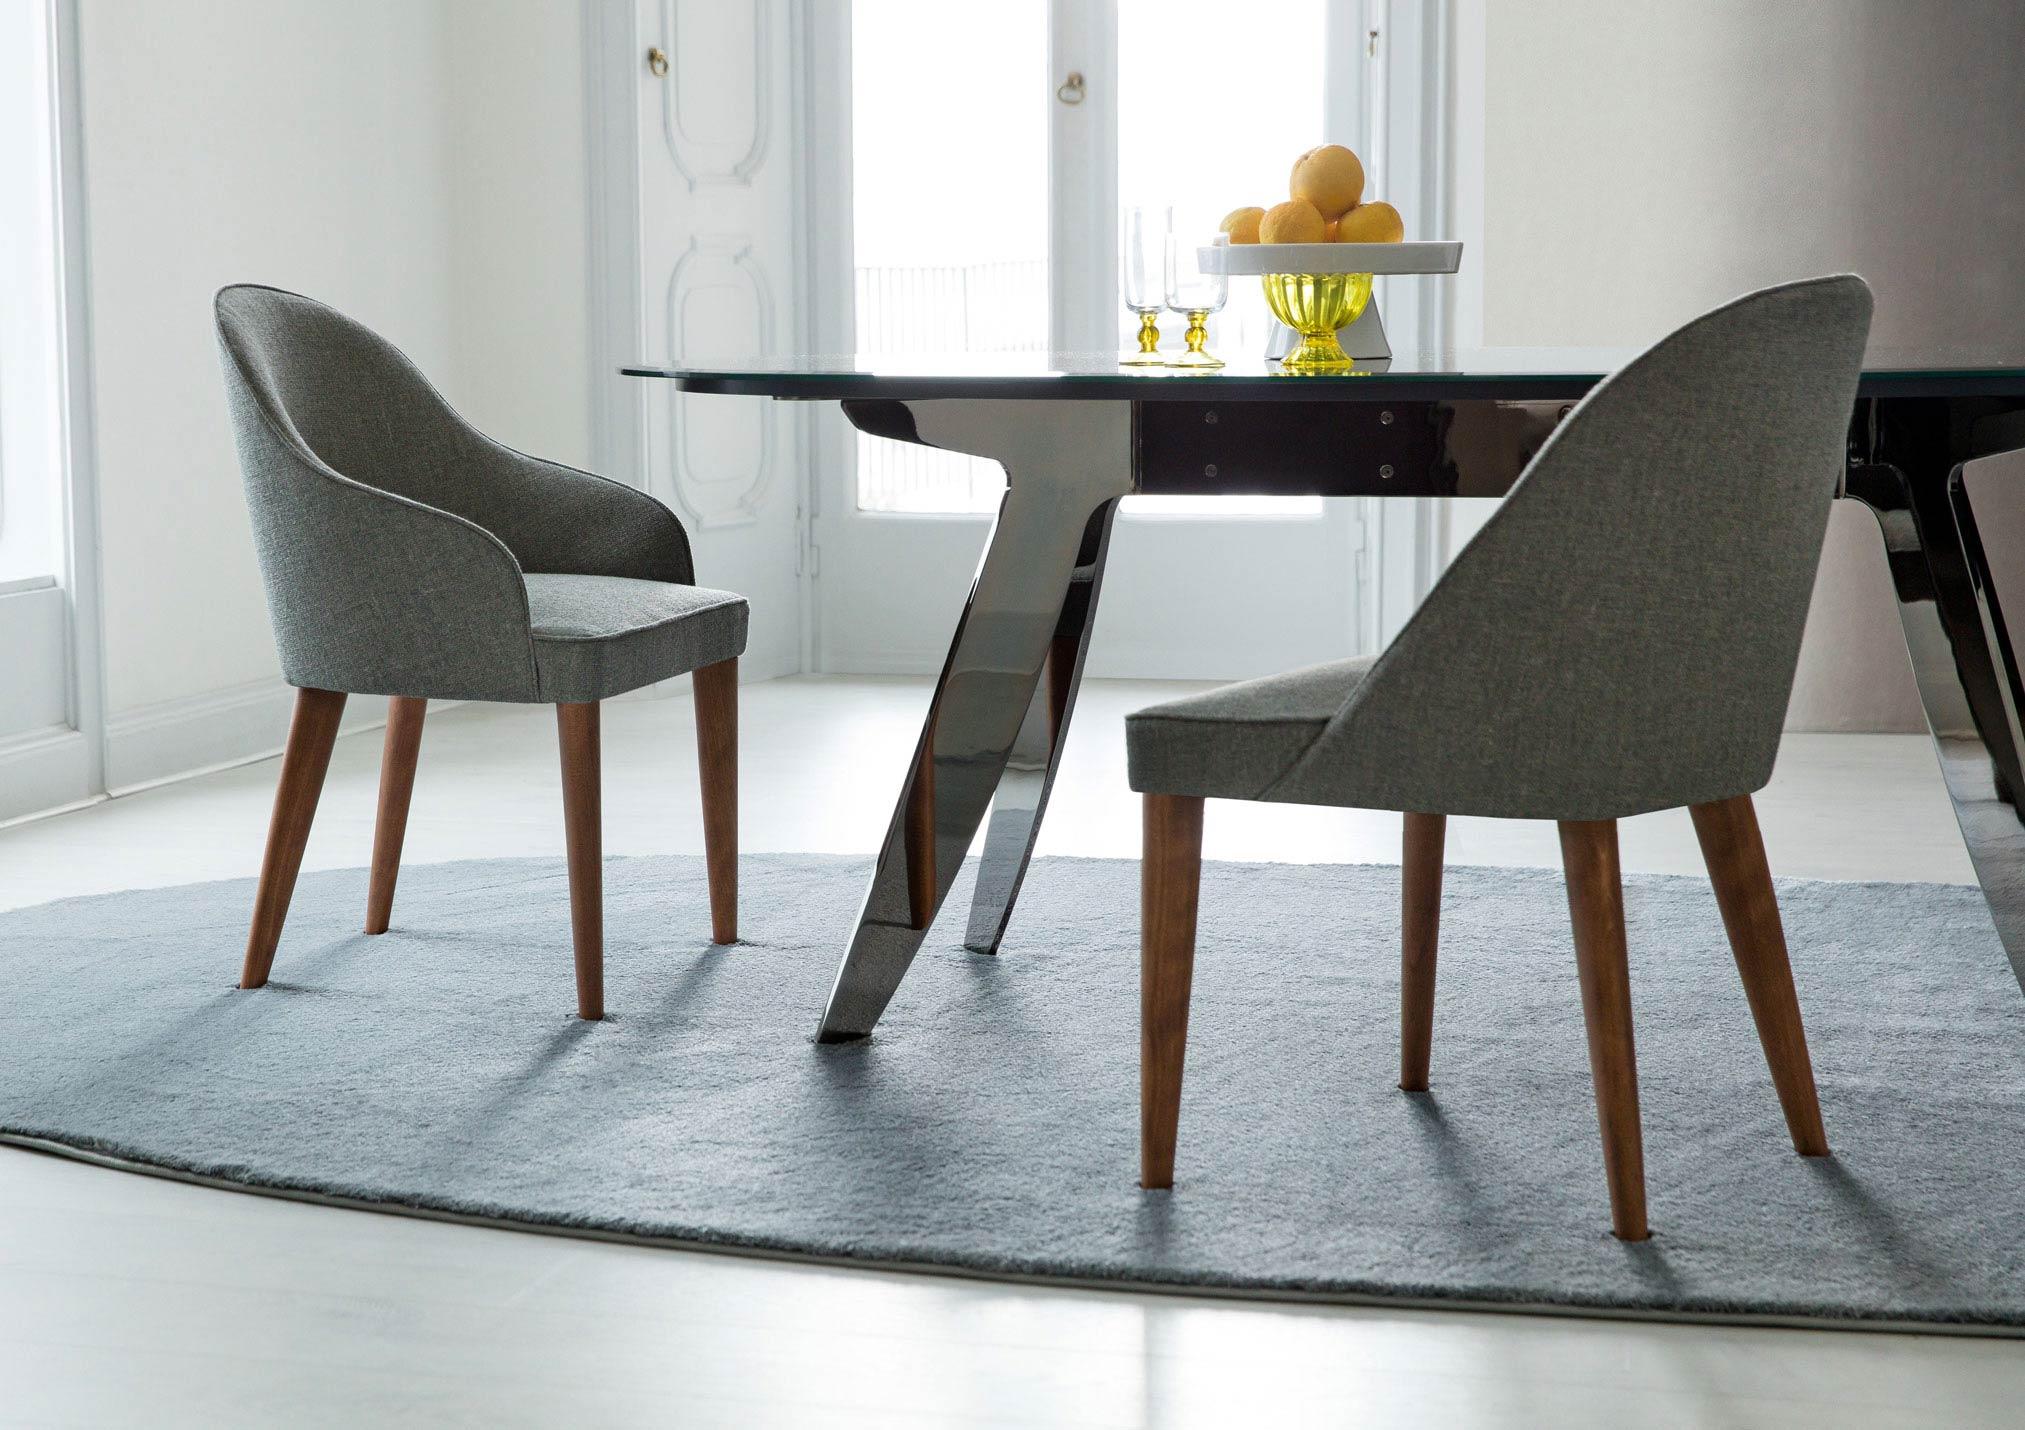 Popolare Judy, la prima sedia da tavolo moderna made by BertO | Bertostory  ZI63